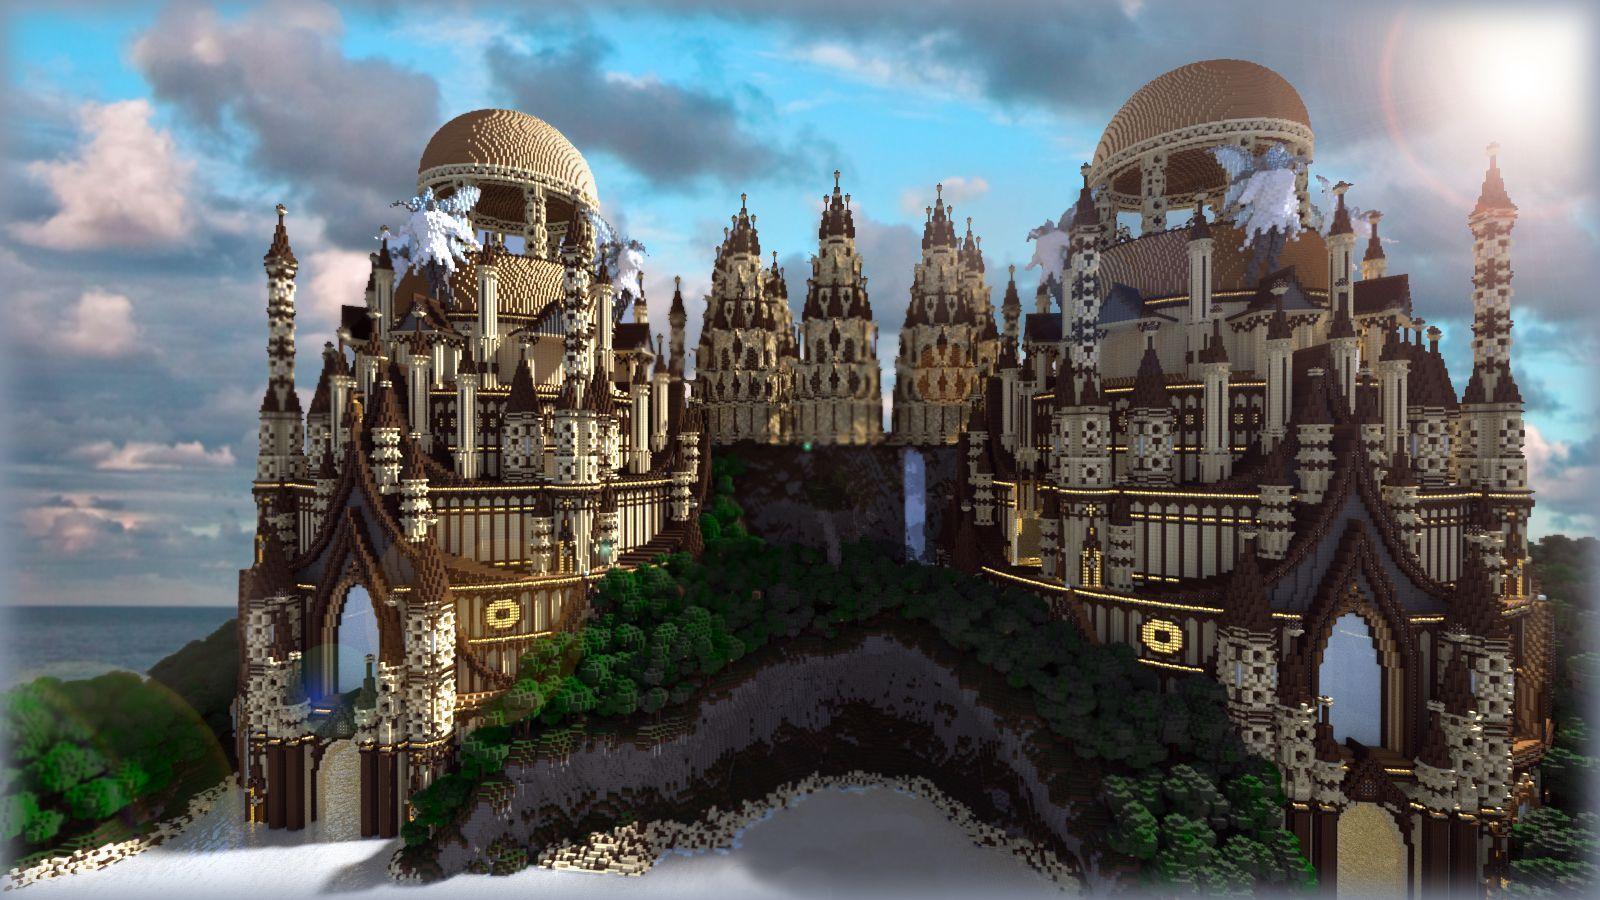 Tropical Sandstone Castle       Imgur Com  A  5frlk